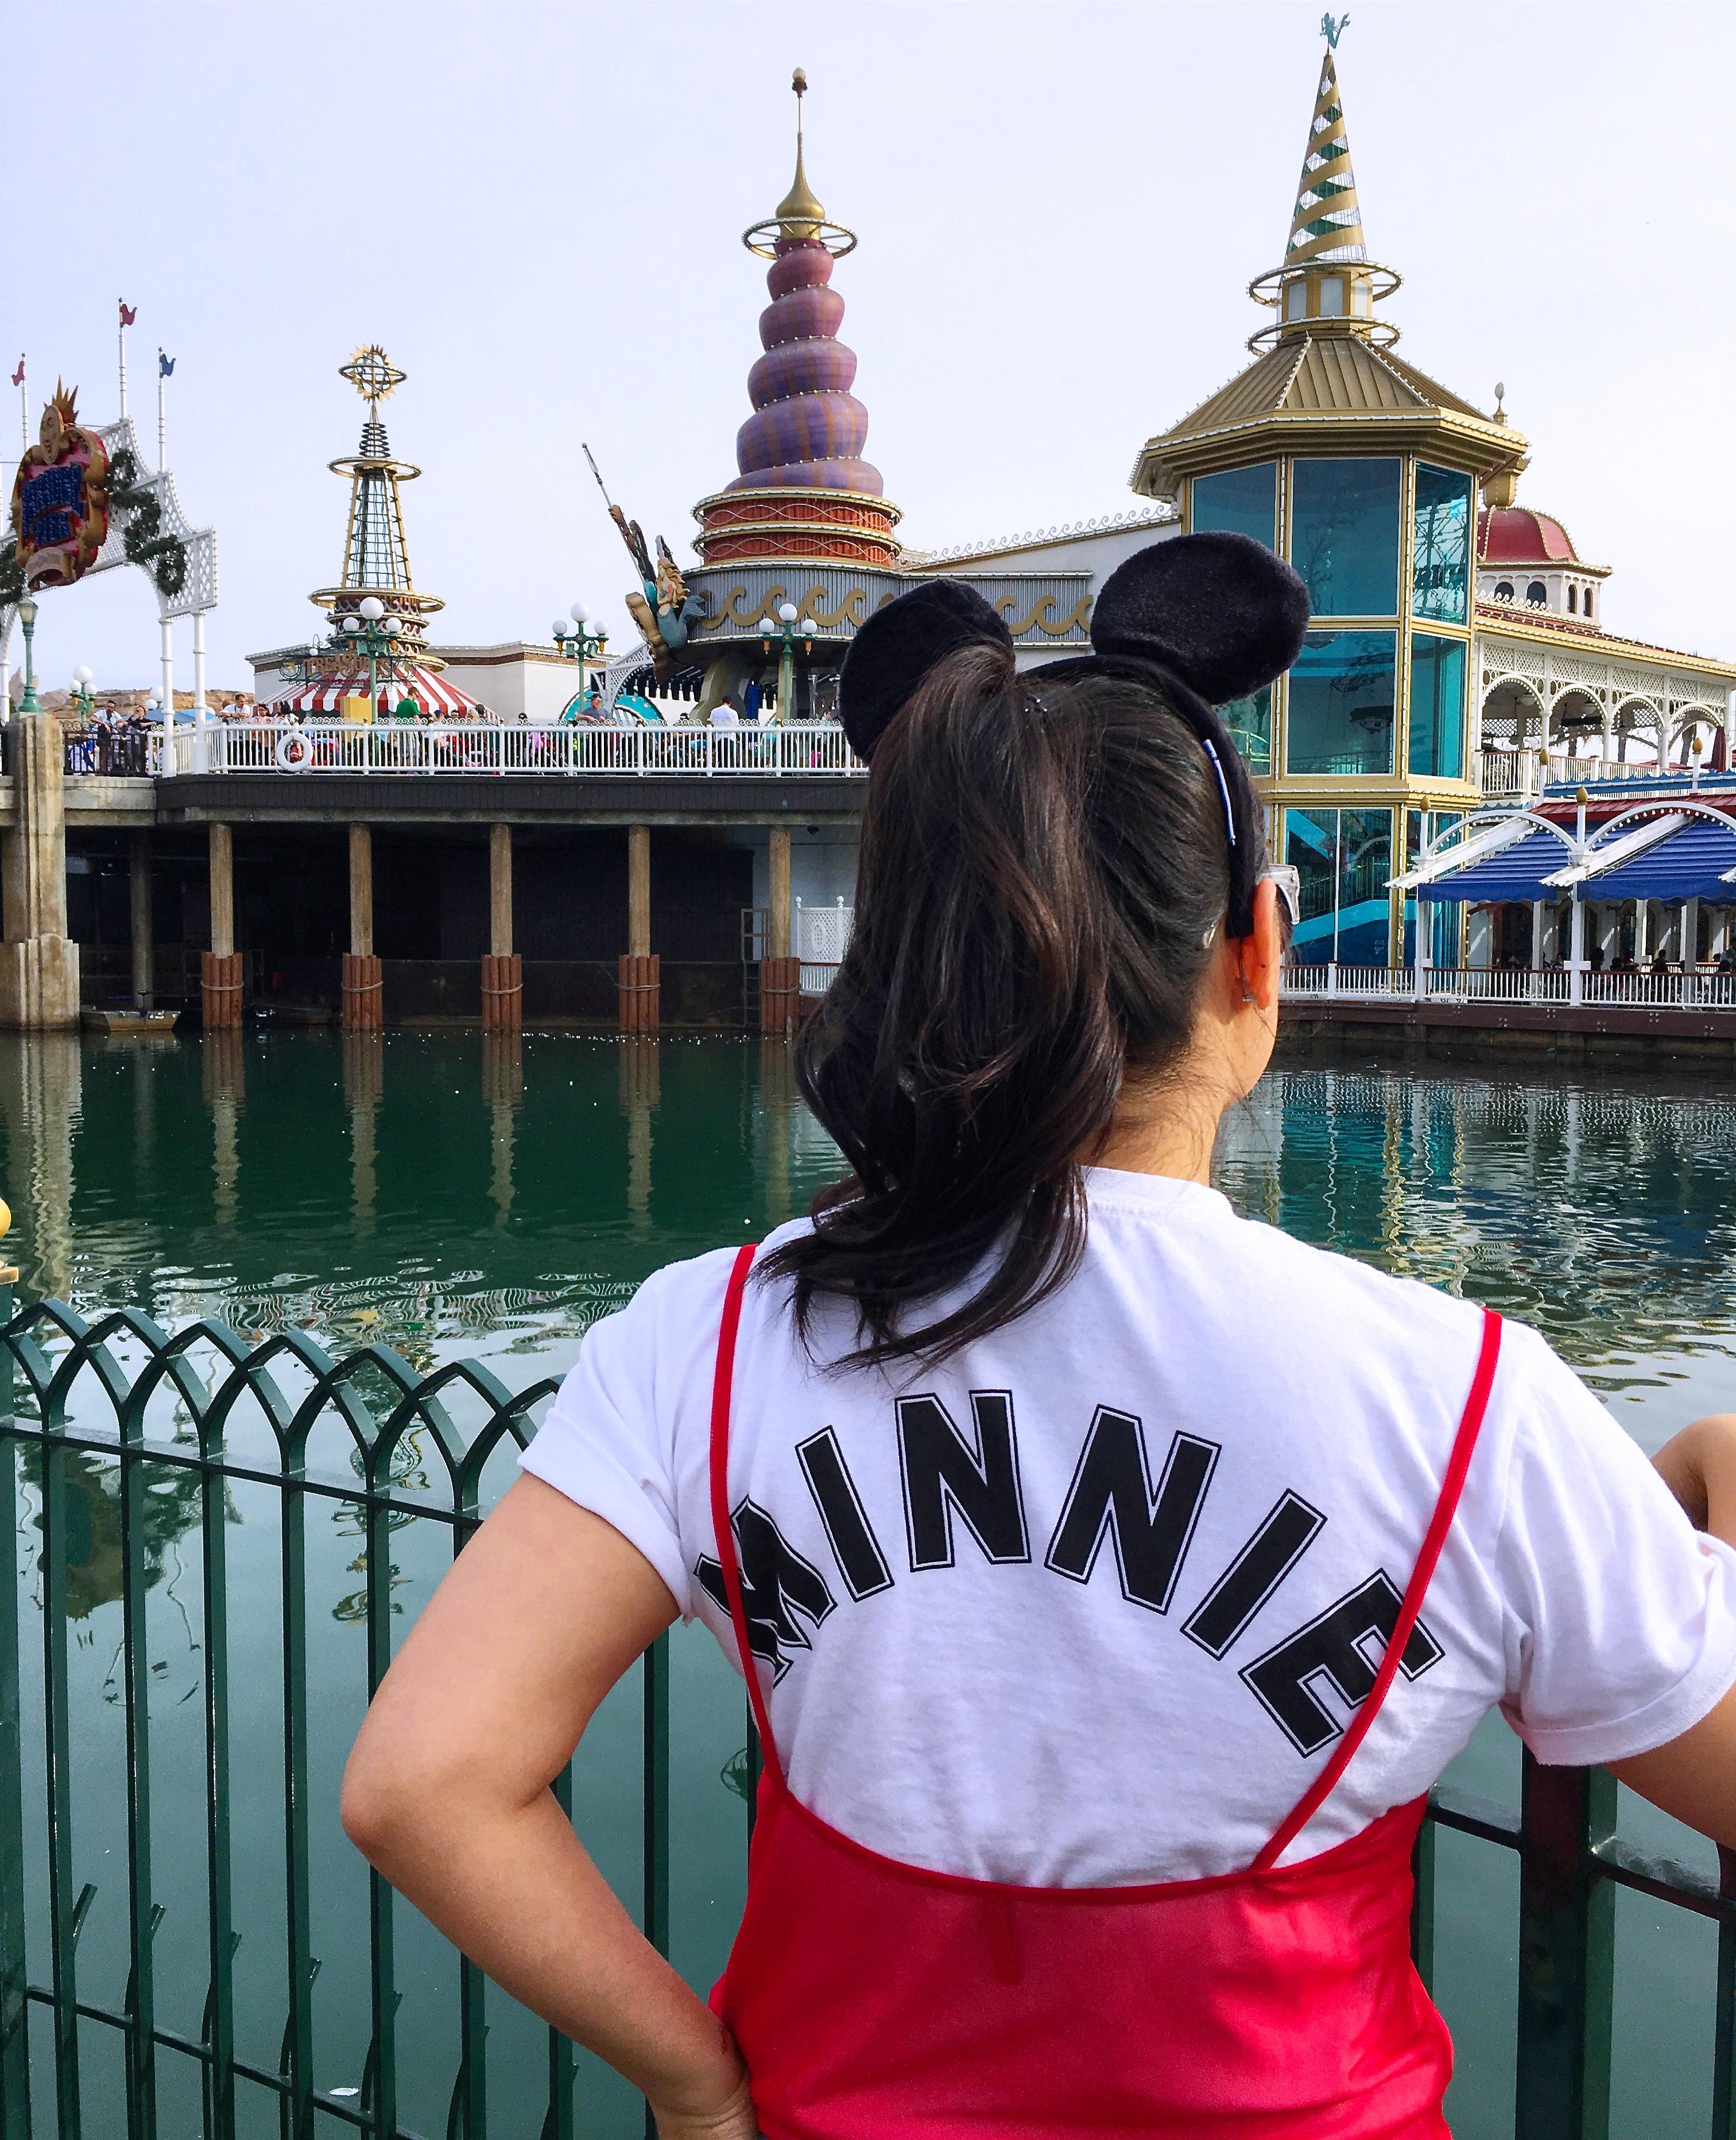 california adventure paradise pier minnie style mickey mouse disney style